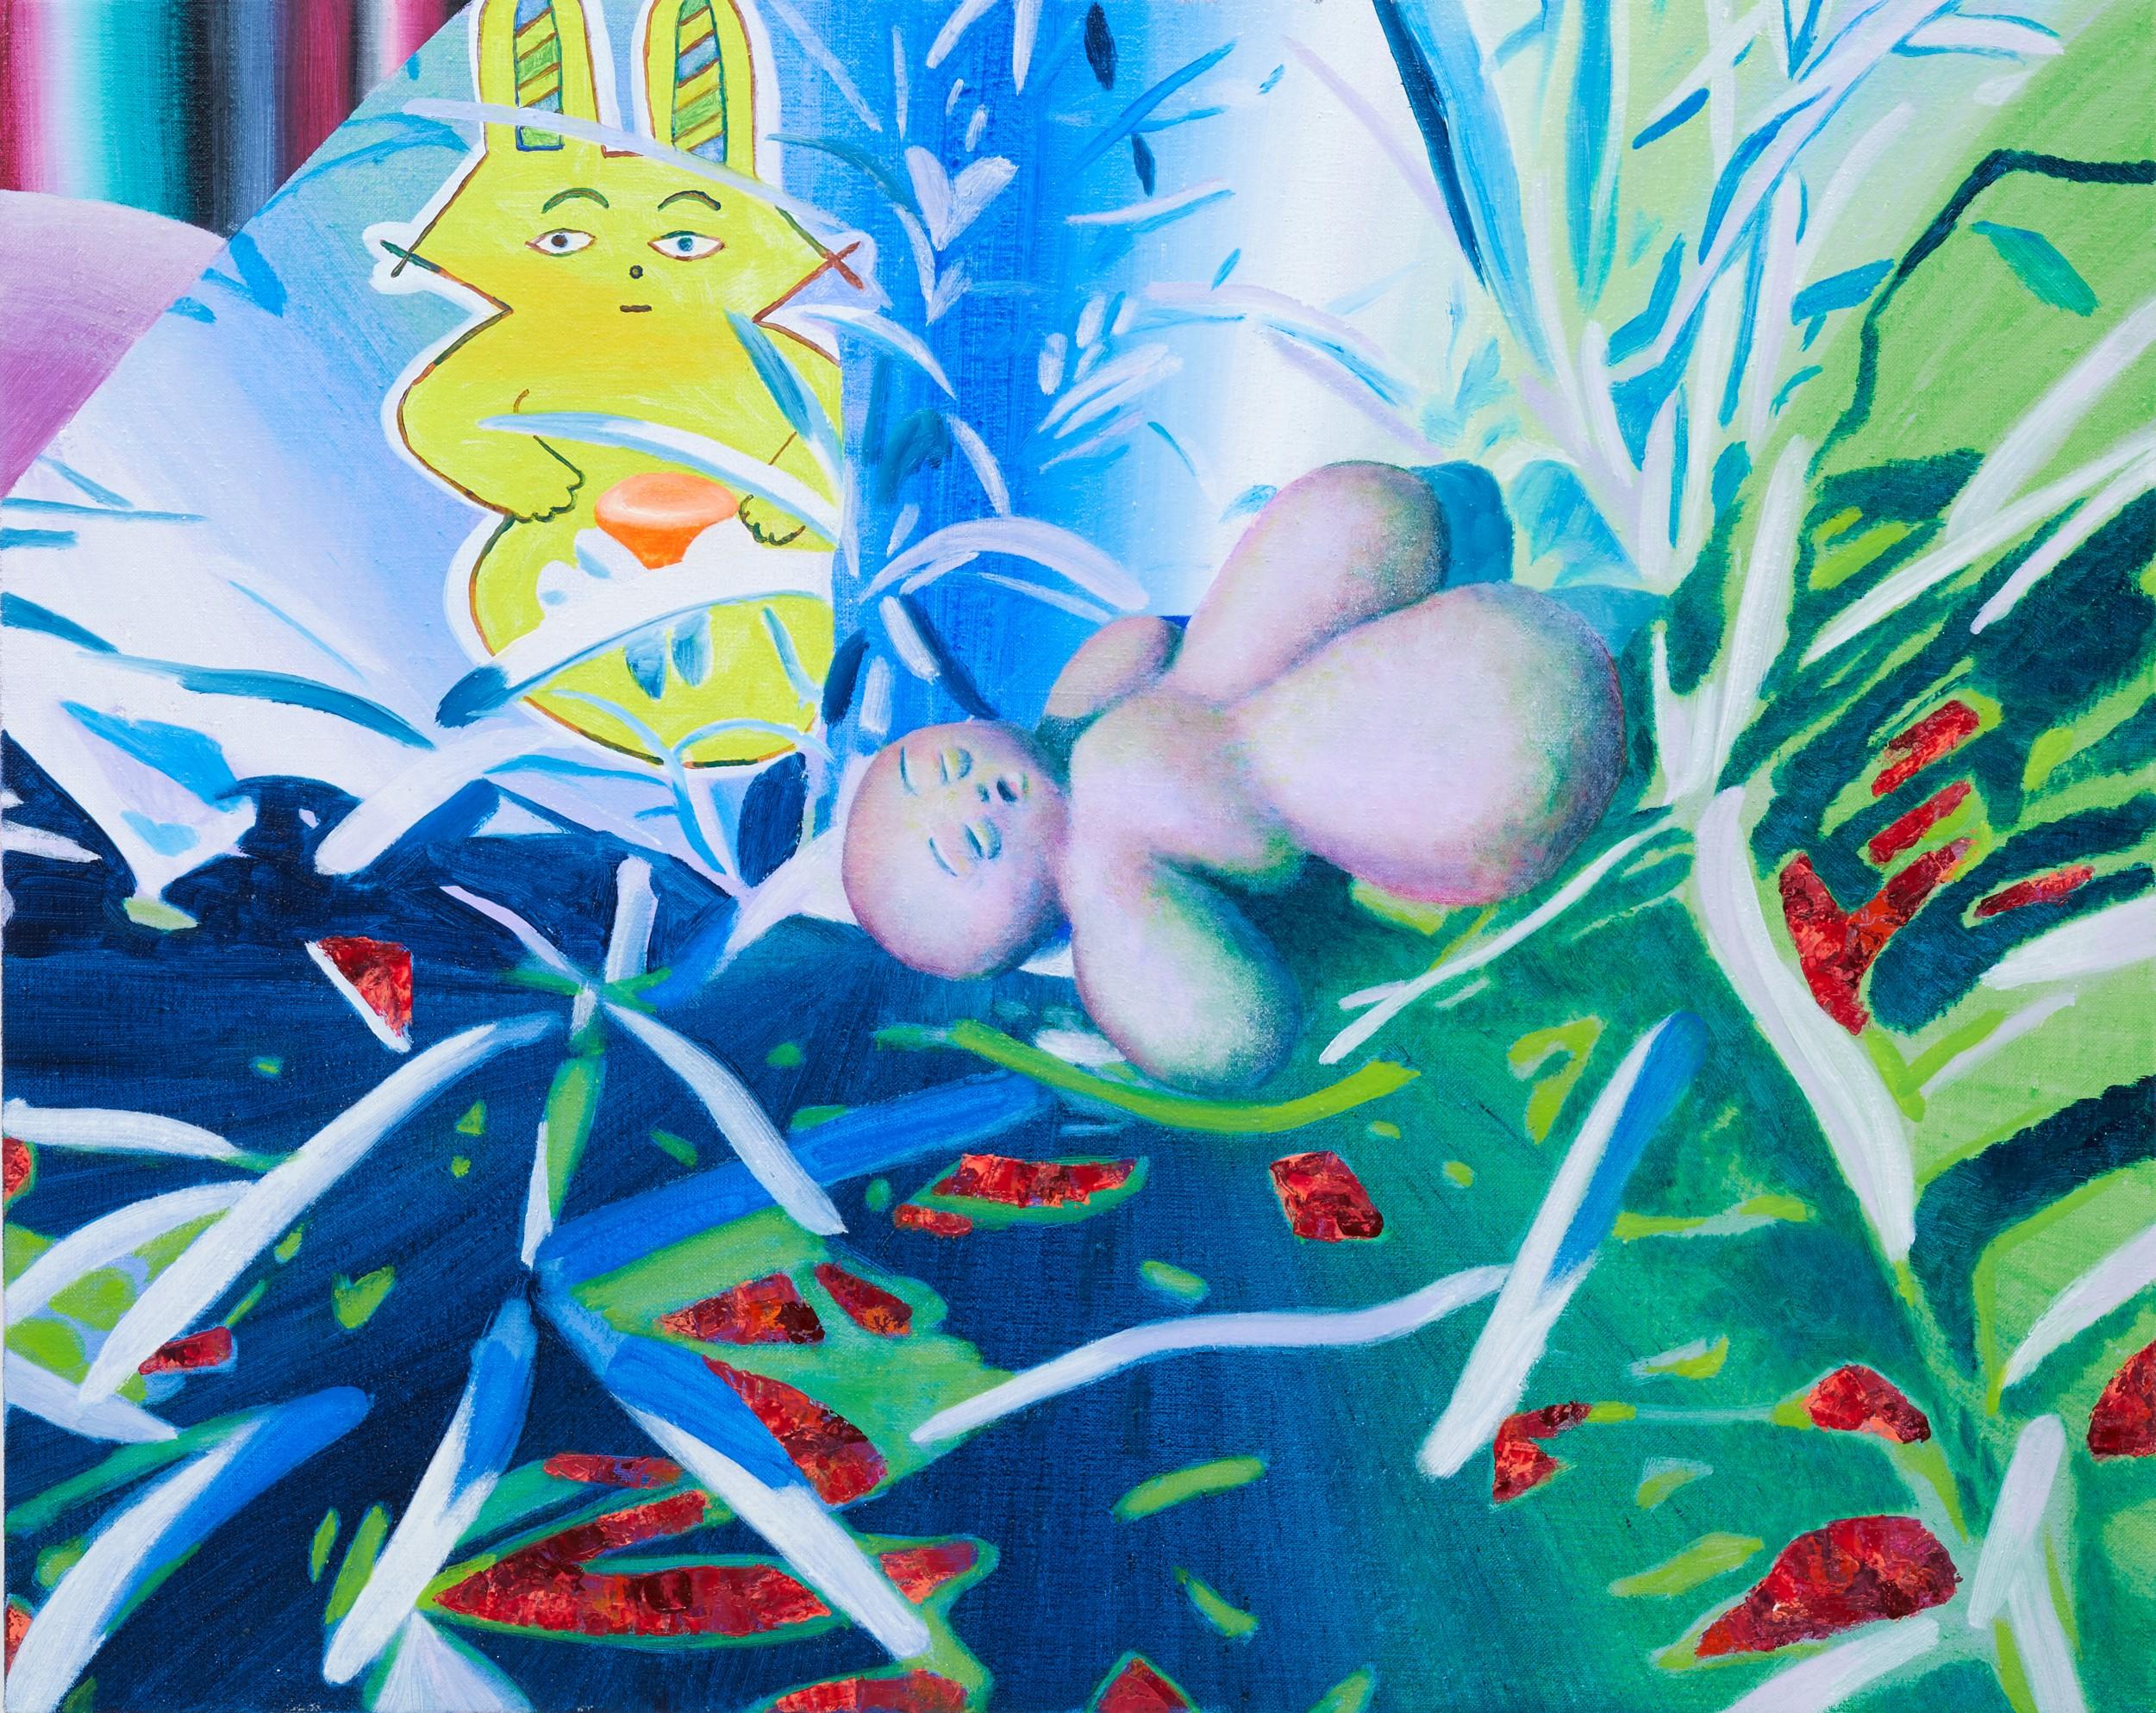 Sleeping stone ver.2 2017 油彩在畫布 oil on canvas 72.5 x 91.5 cm